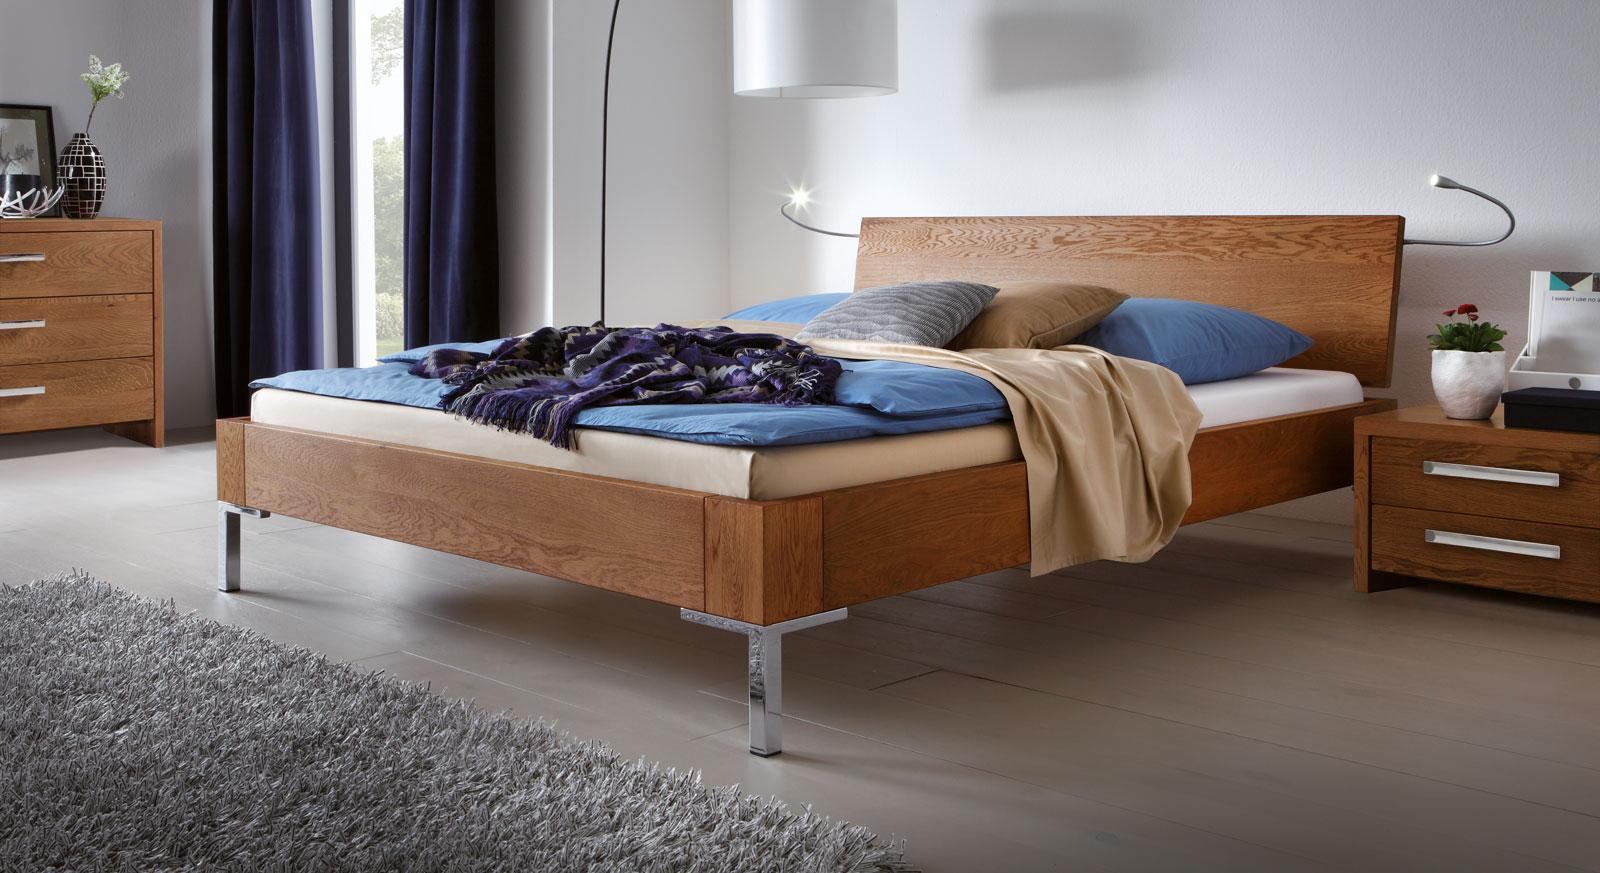 betten 140x200 m bel inspiration und innenraum ideen. Black Bedroom Furniture Sets. Home Design Ideas